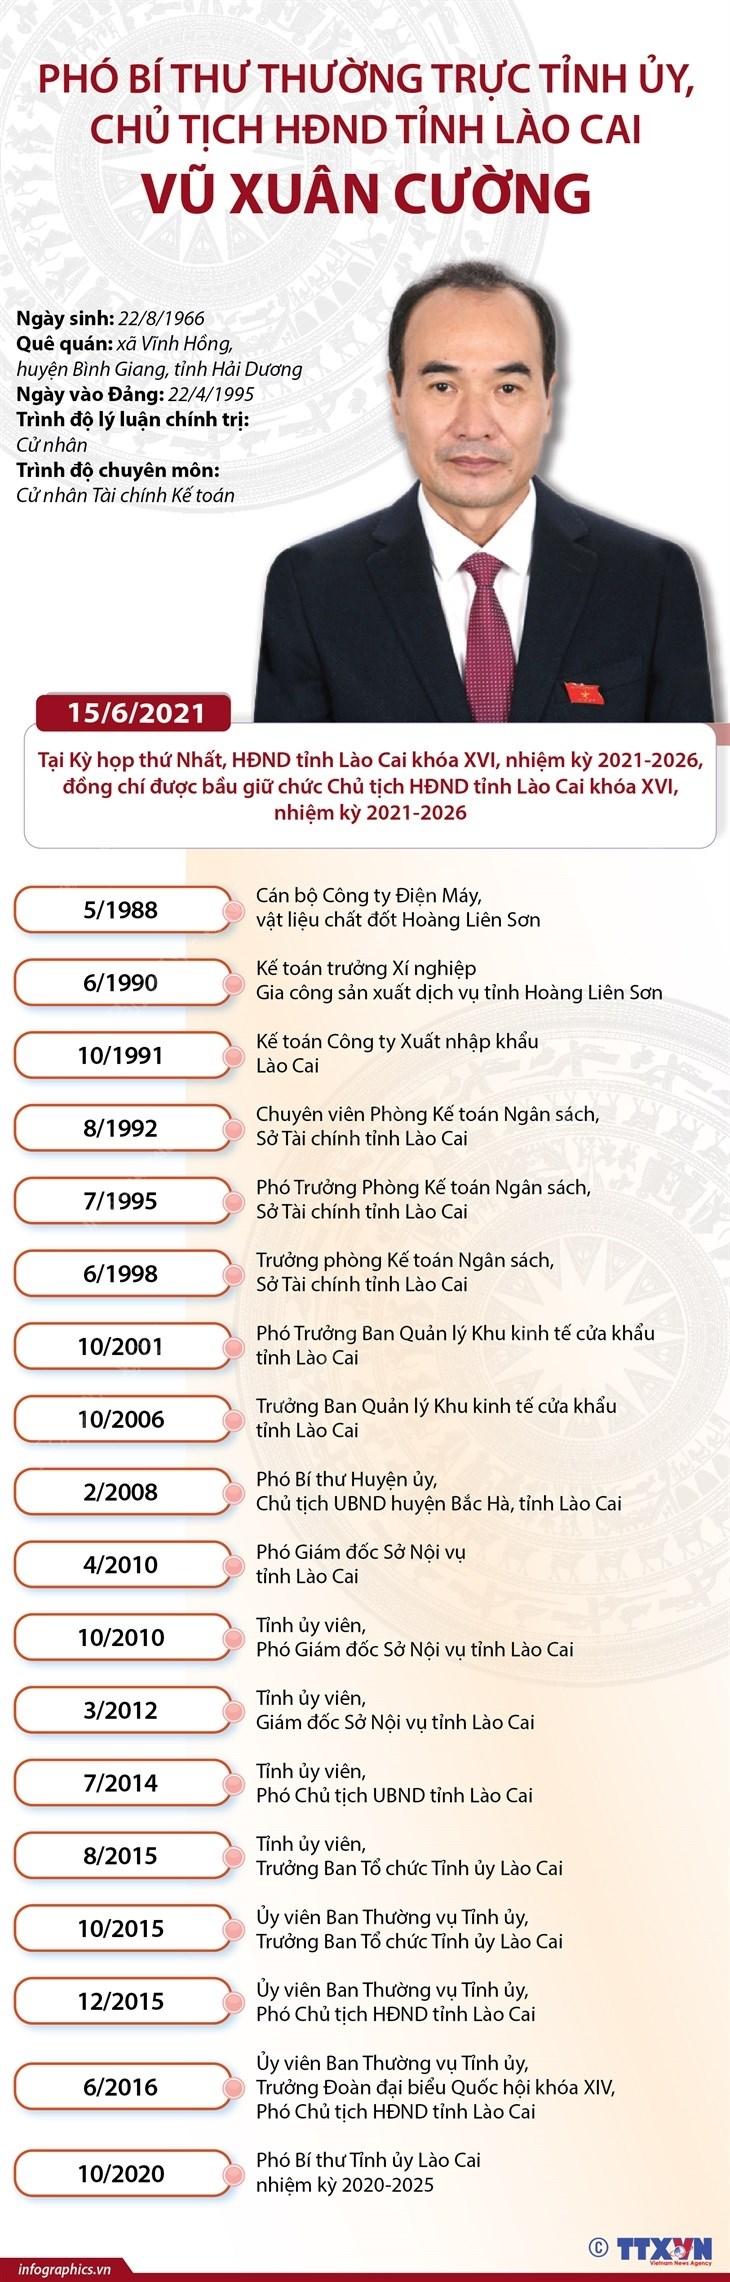 Tieu su hoat dong Chu tich HDND tinh Lao Cai Vu Xuan Cuong hinh anh 1